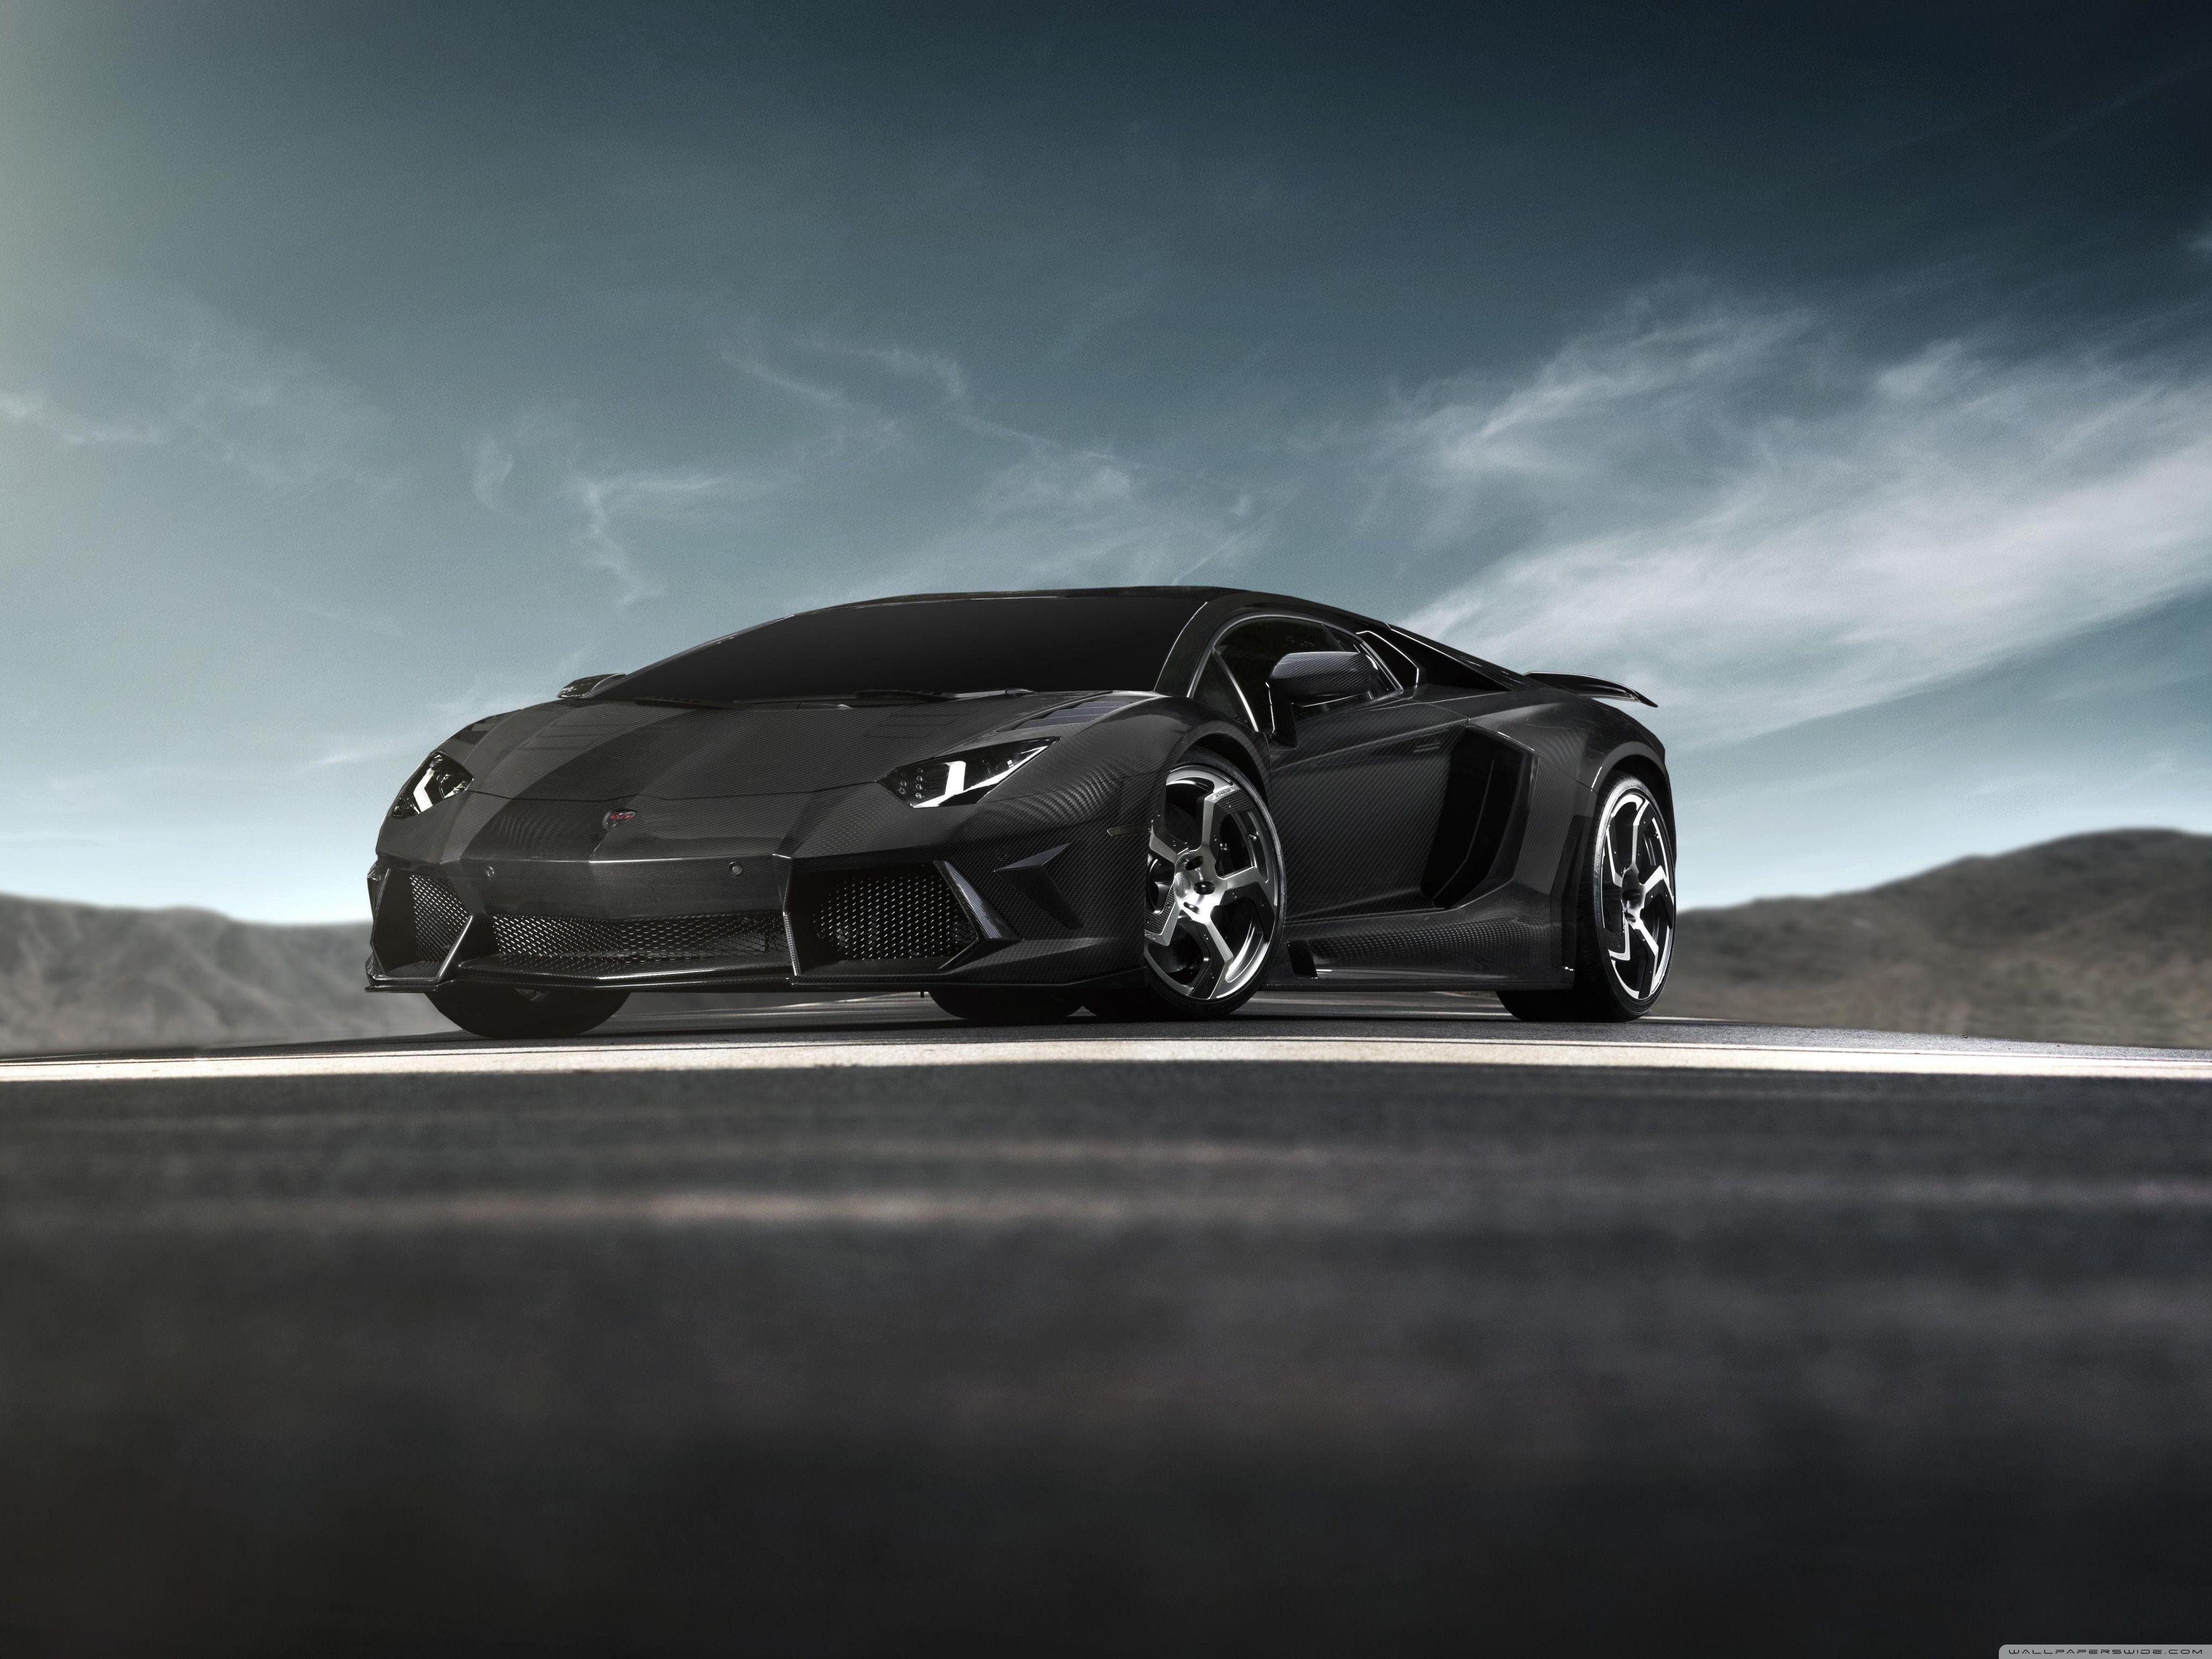 "2560x1600 lamborghini wallpapers (66+ images)"">. Black Lamborghini Wallpapers Wallpaper Cave"